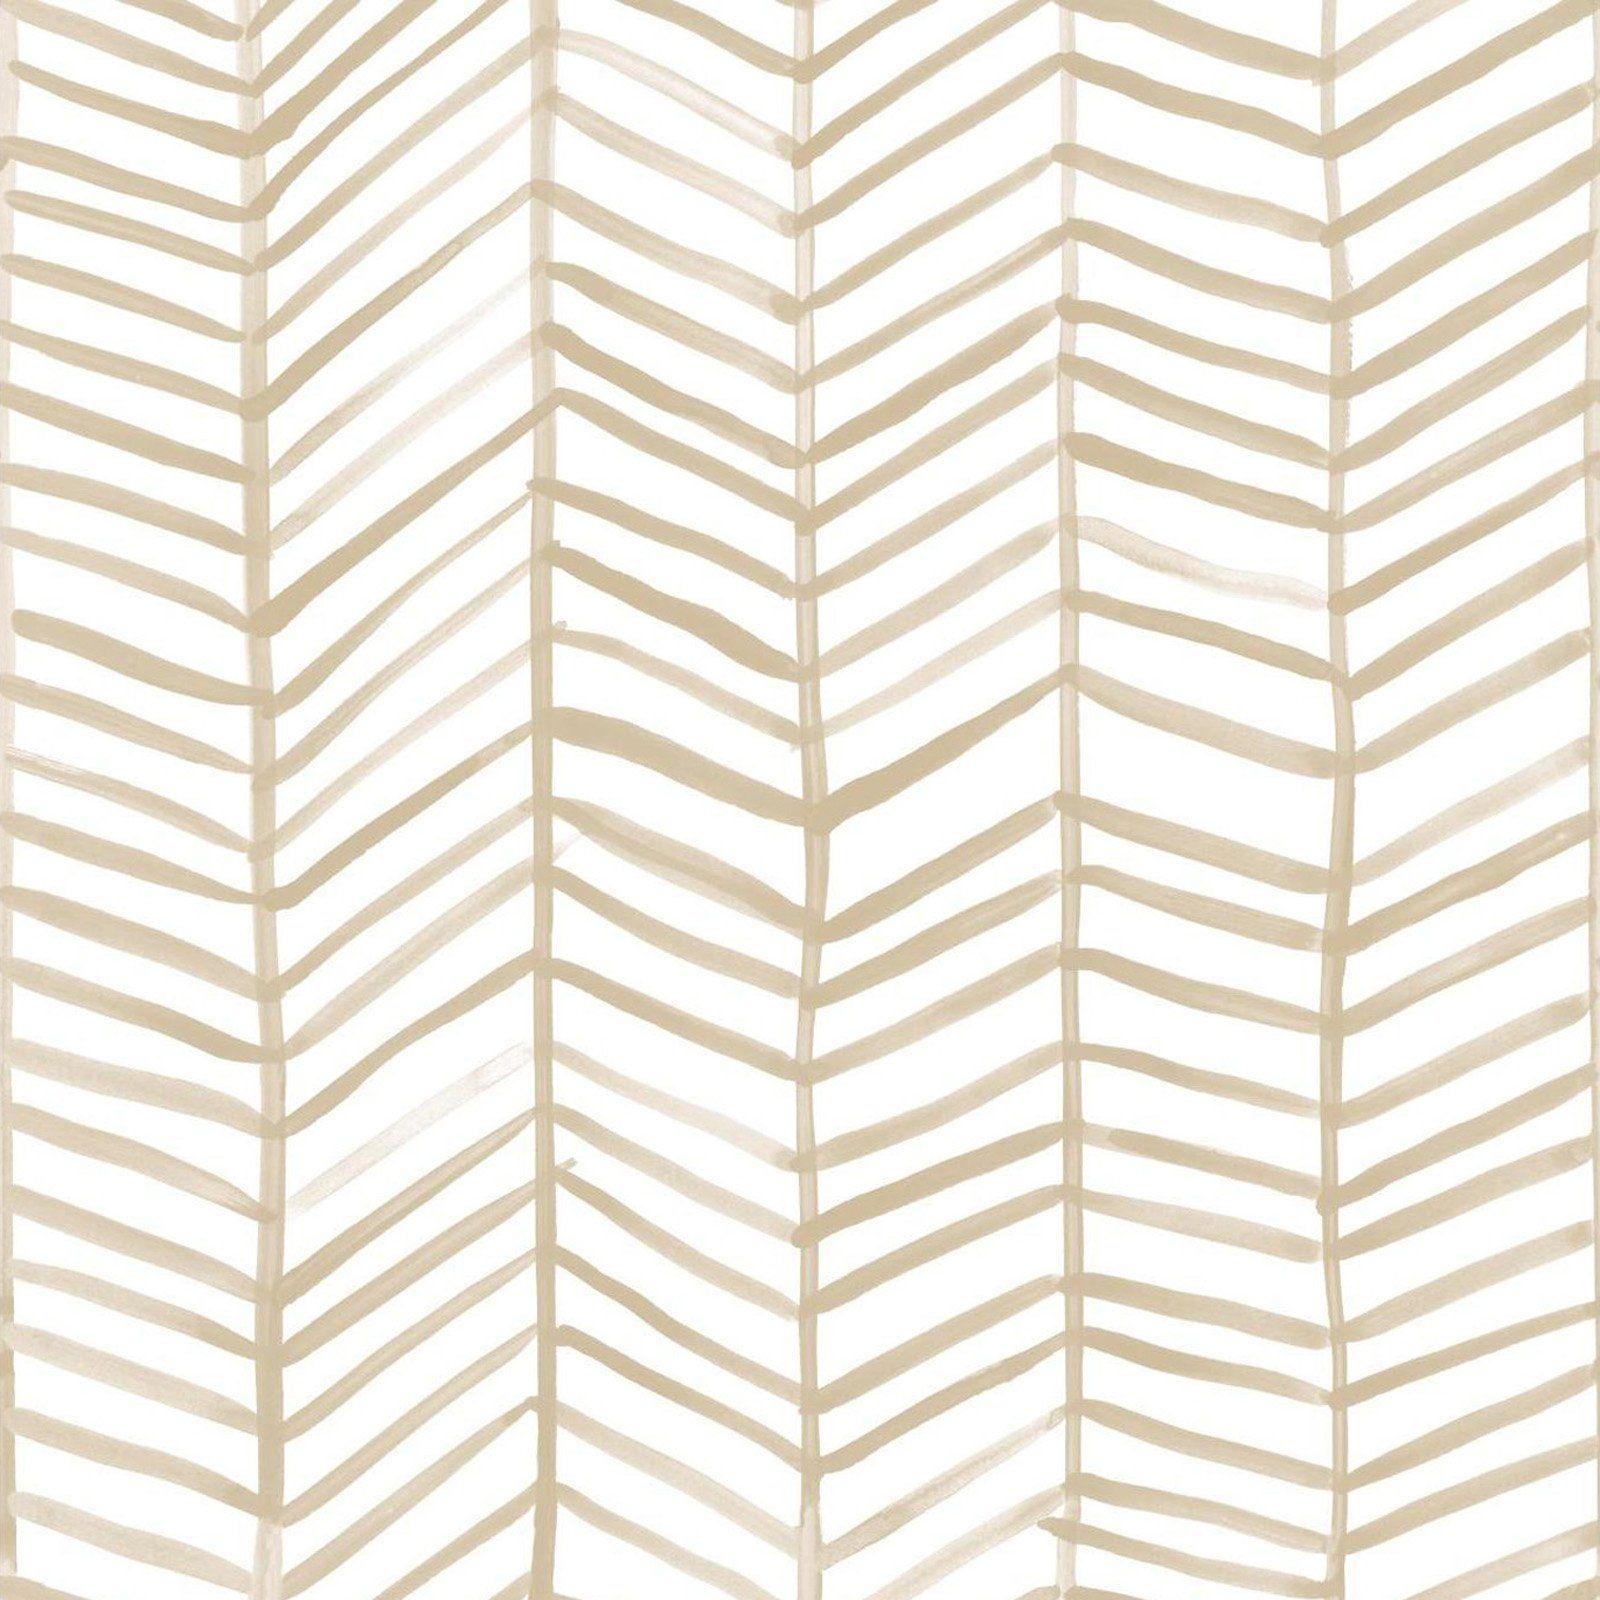 Roommates Herringbone Self Adhesive Wallpaper Tan Herringbone Wallpaper Peel And Stick Wallpaper Herringbone Wall